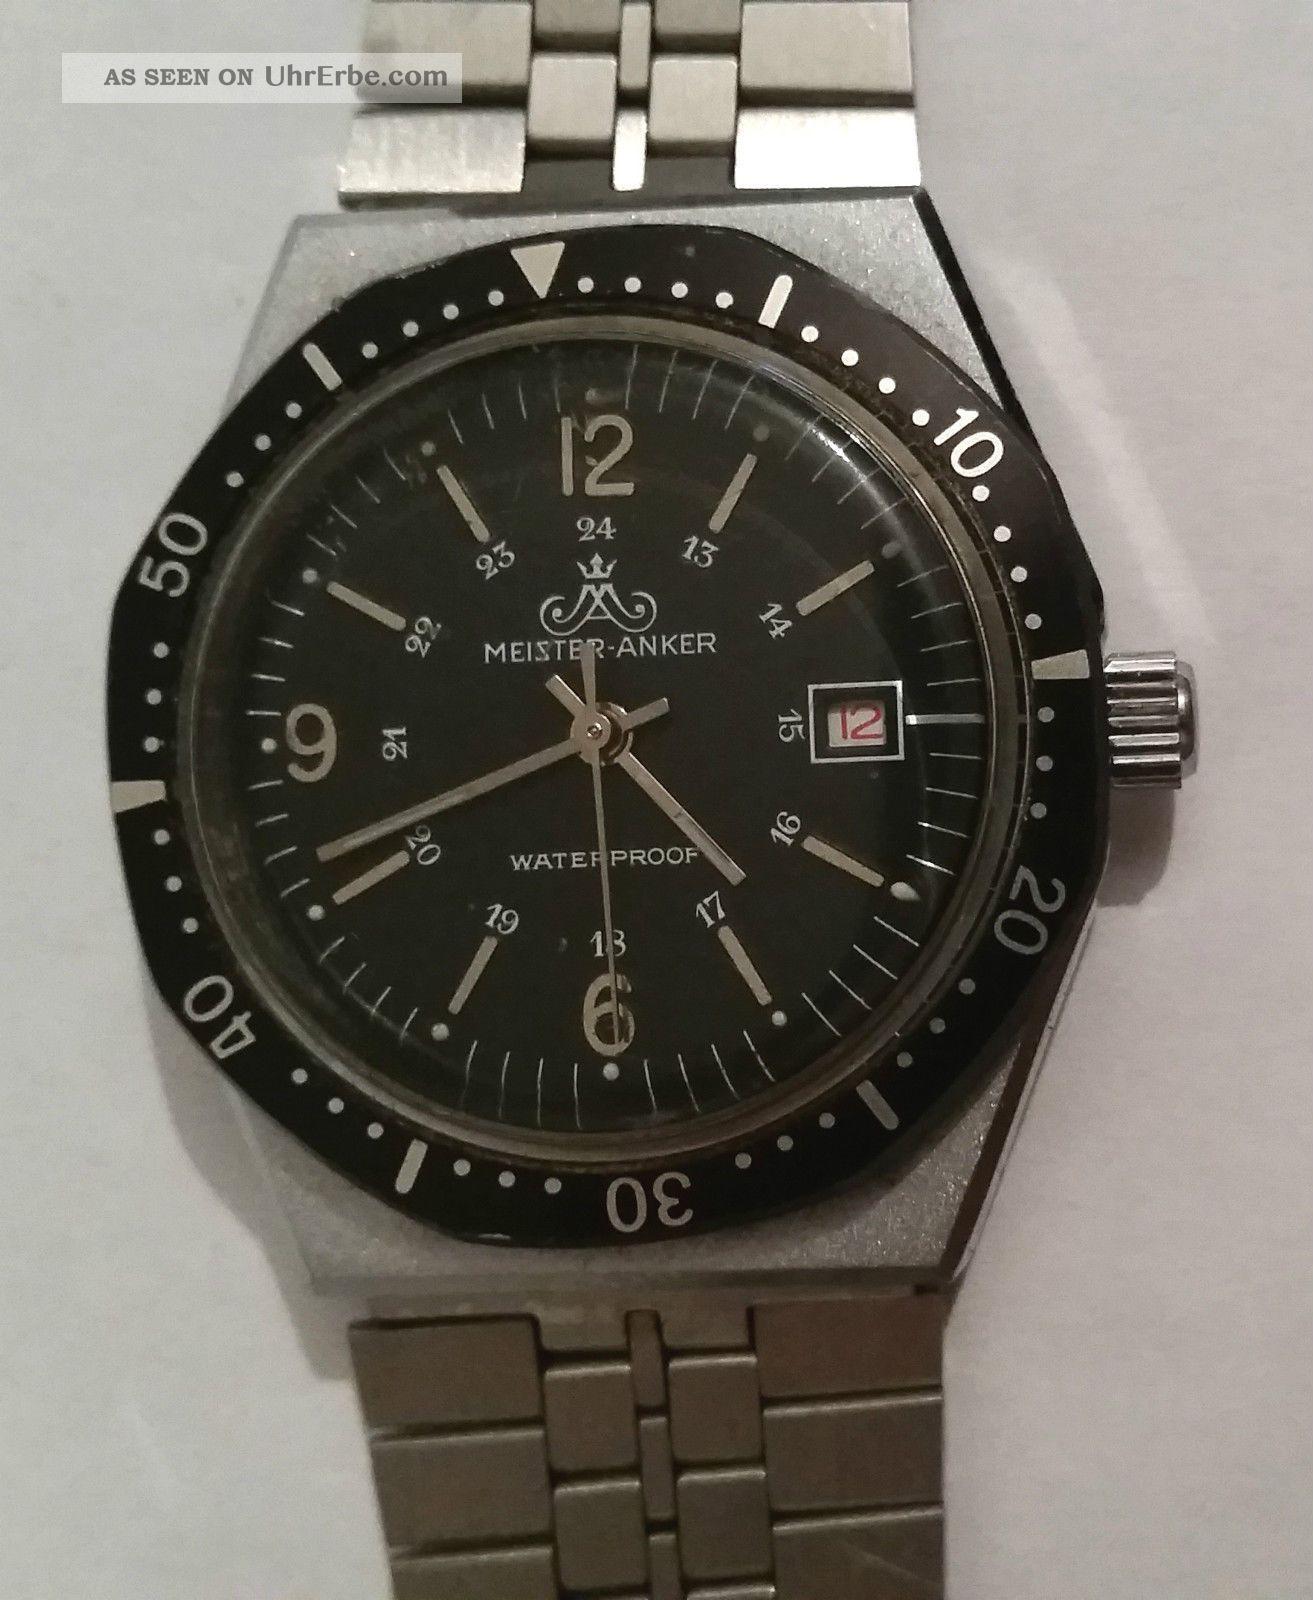 Meister Anker Ma Waterproff Armbanduhr Analog Handaufzug Edelstahl Geprüft Vwp Armbanduhren Bild